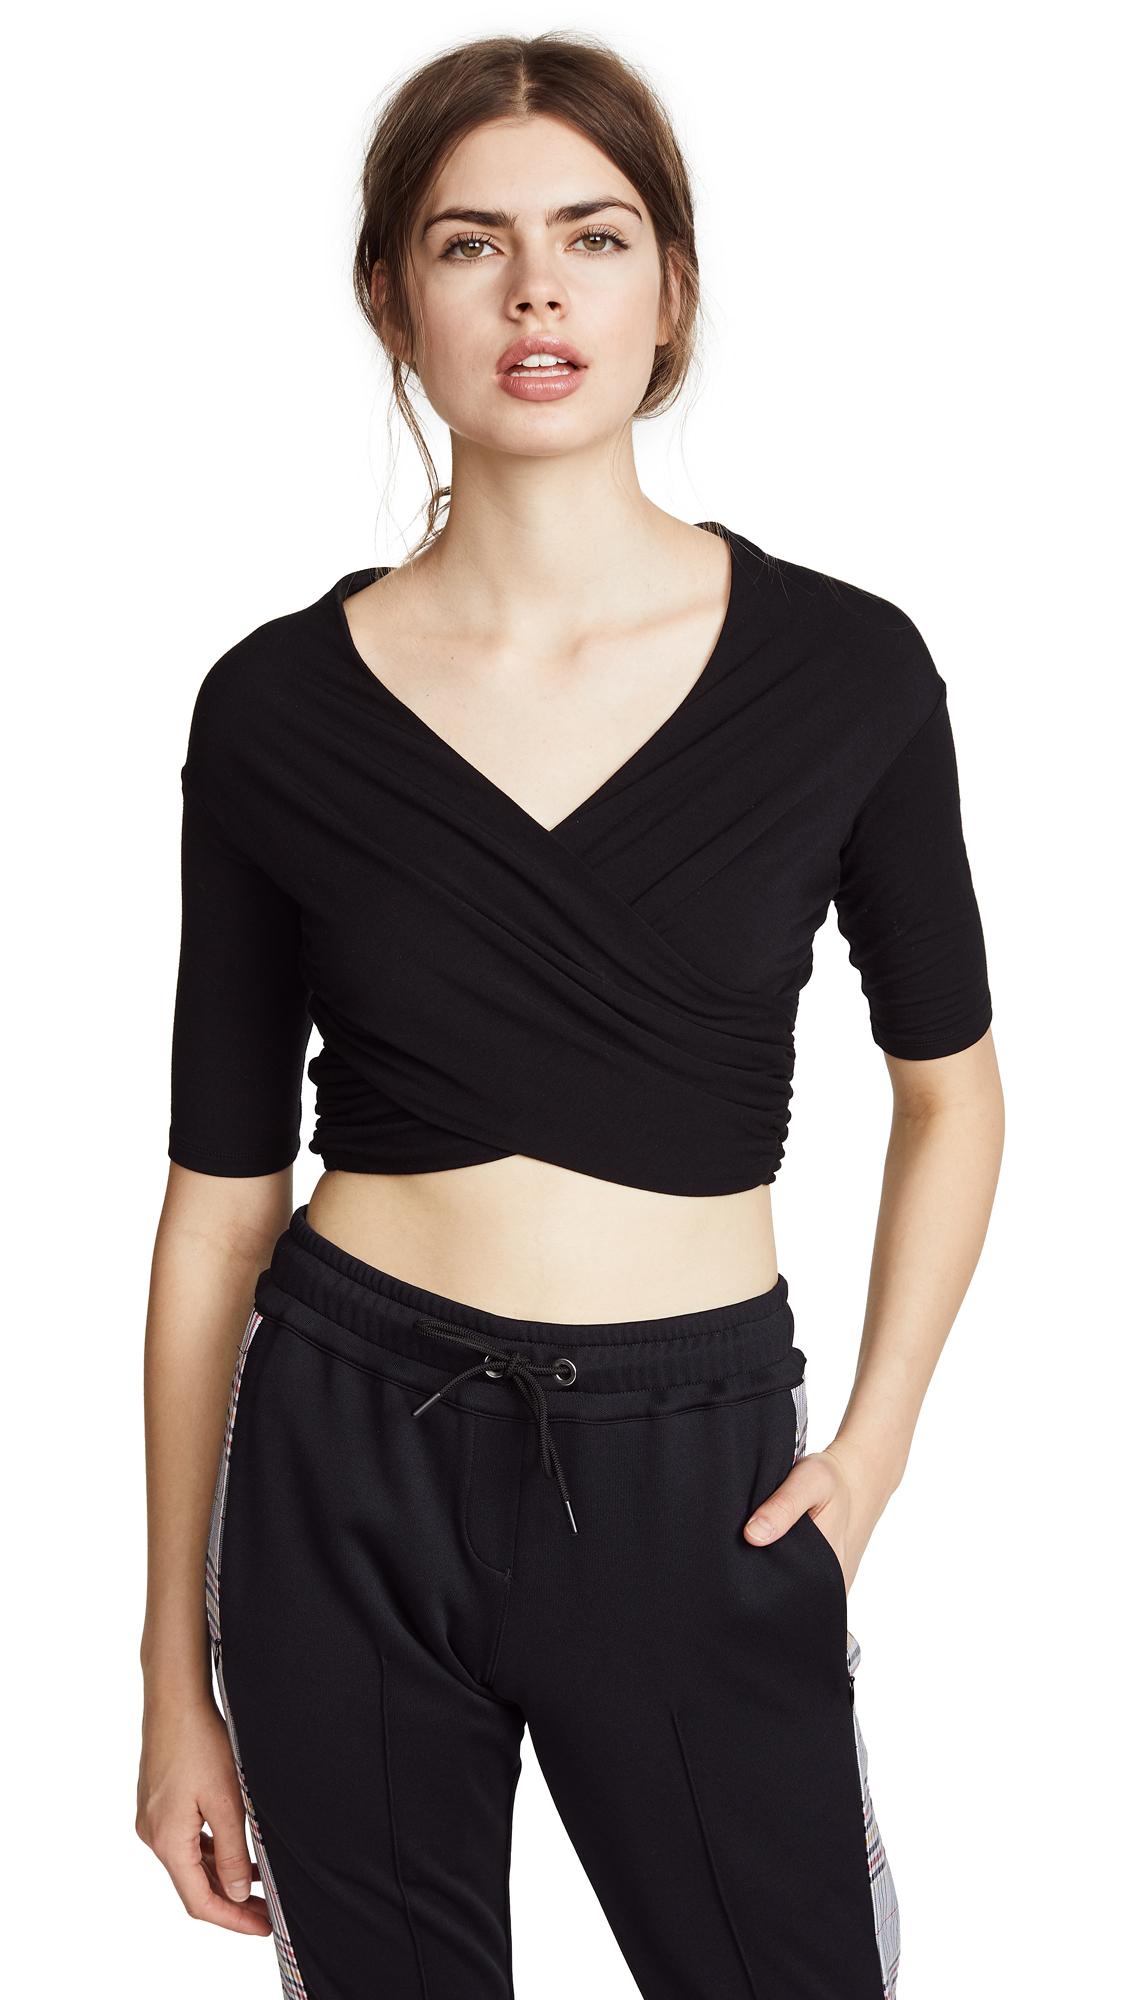 Alexanderwang.T Black Stretch Jersey Double Layer Wrap T-Shirt in 001 Black